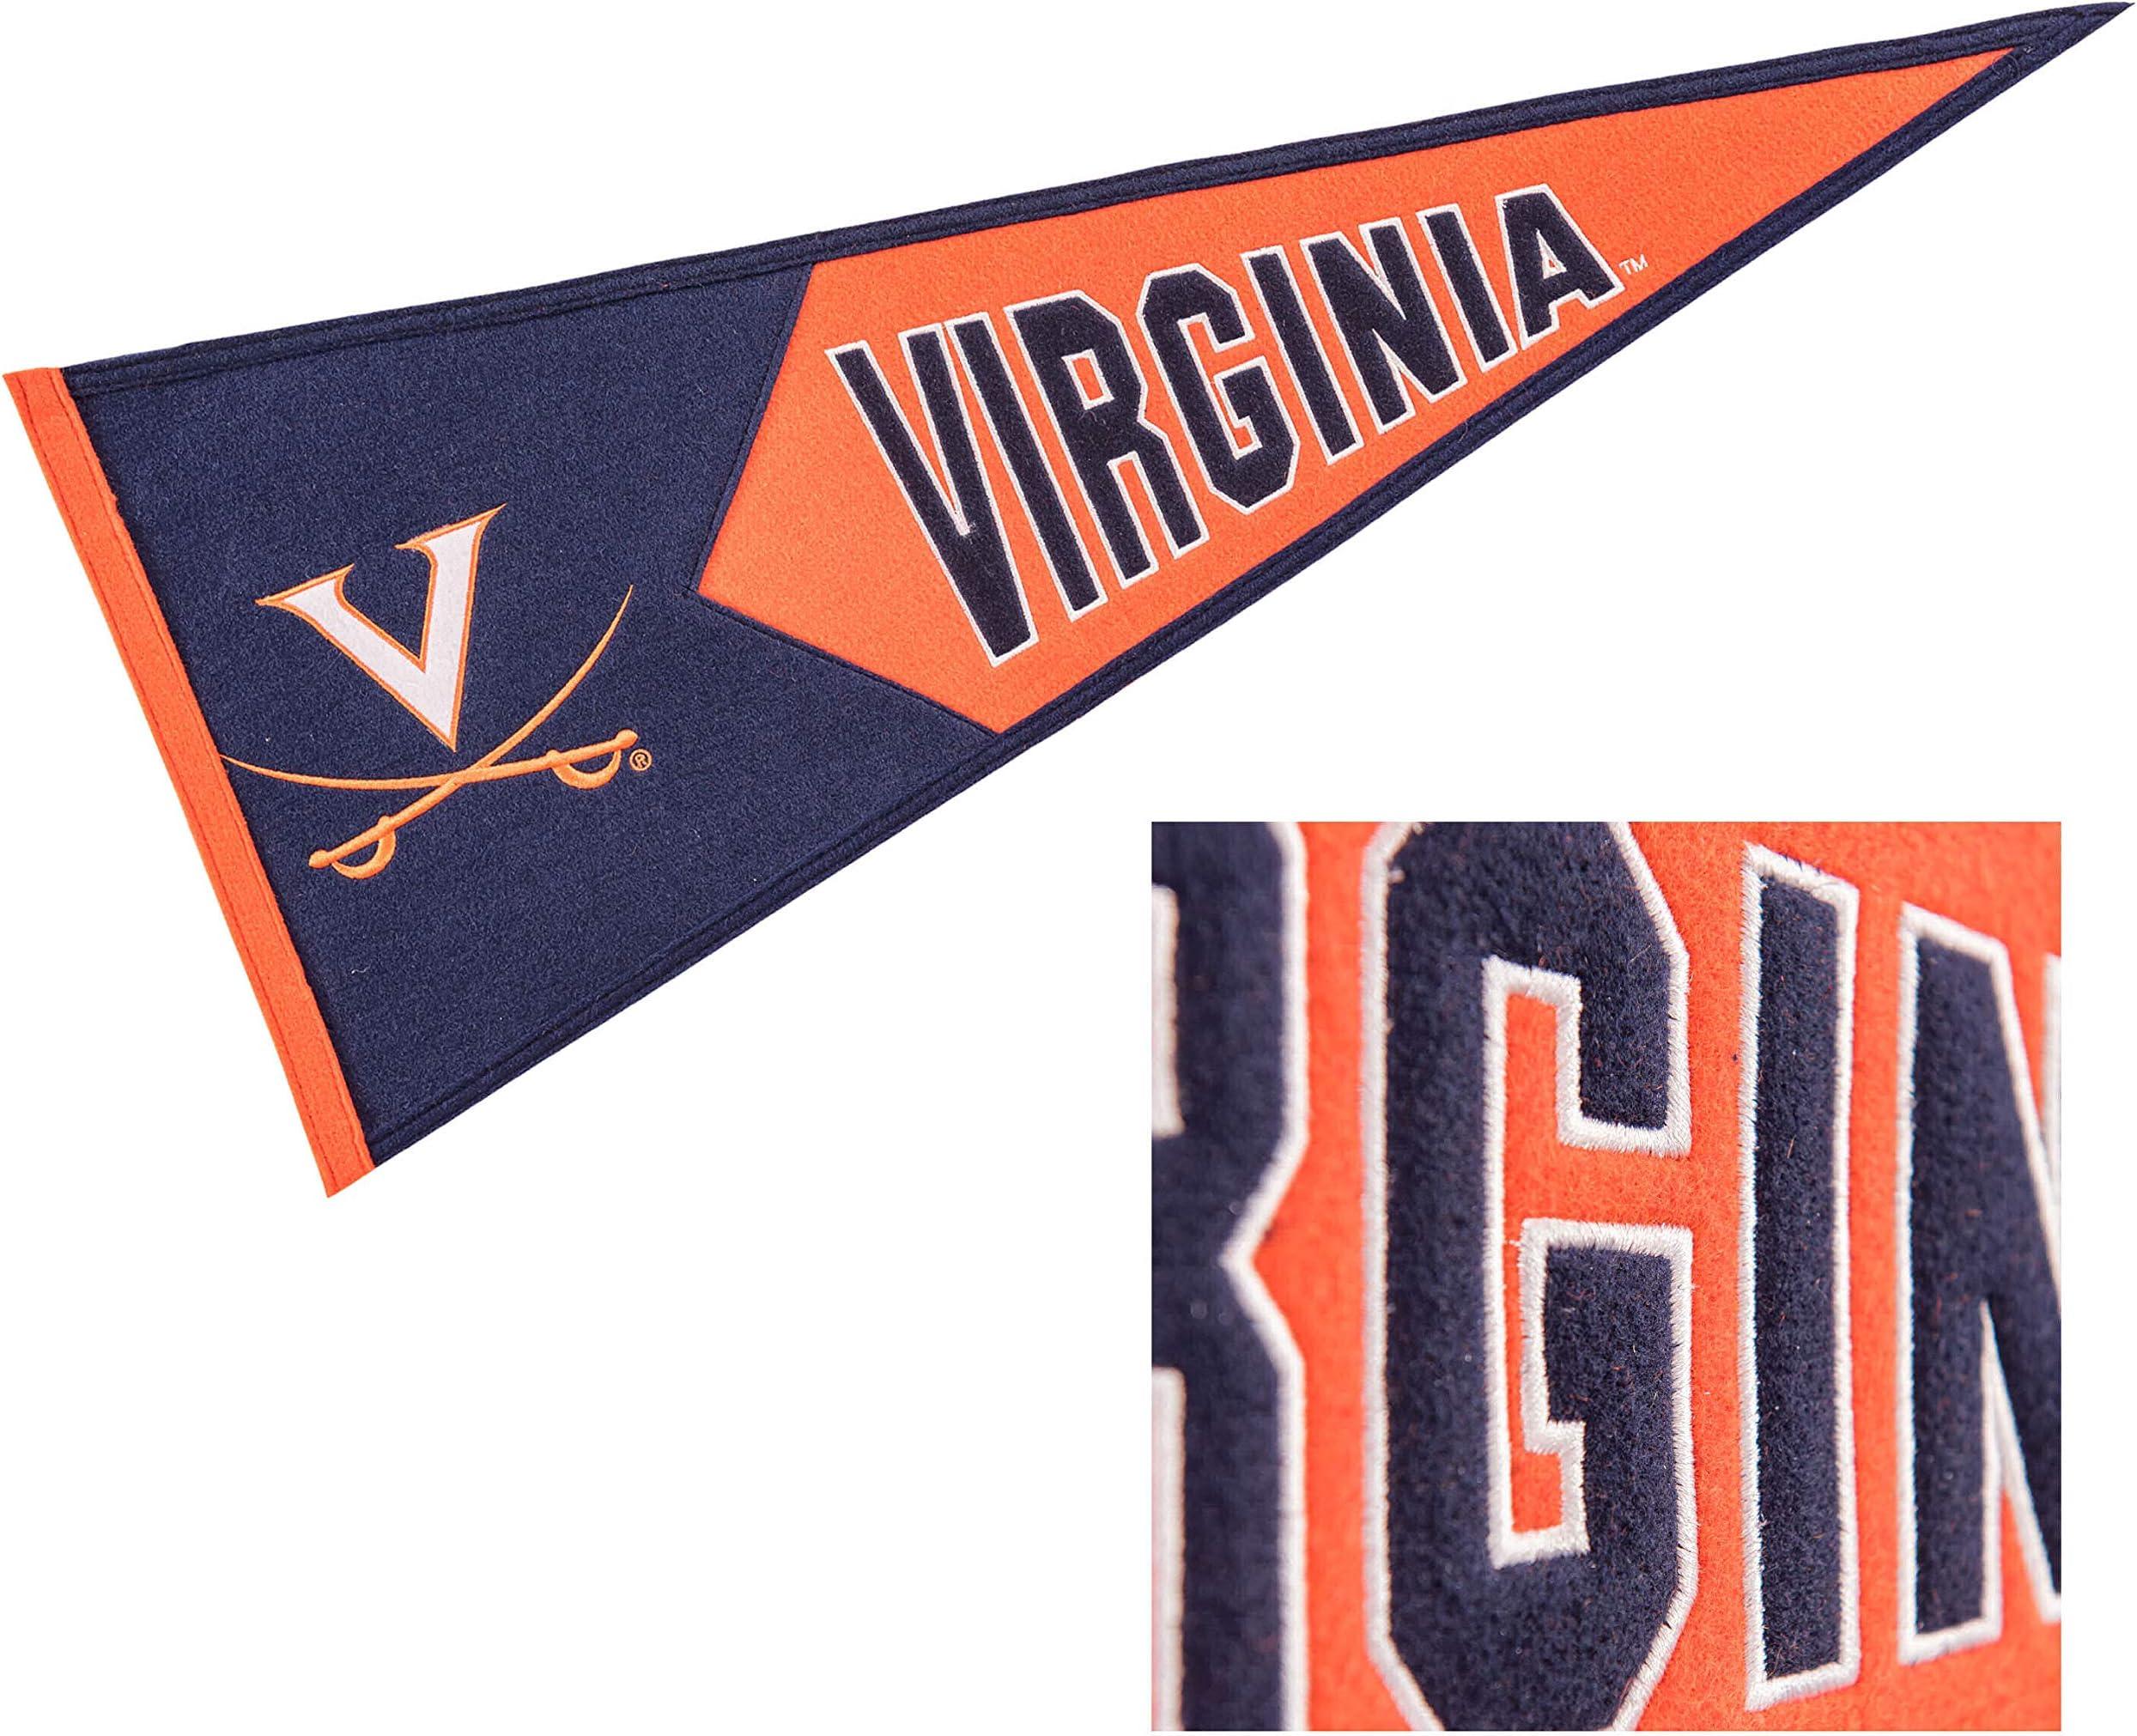 Winning Streak Virginia Cavaliers Wool Embroidered and Sewn Pennant